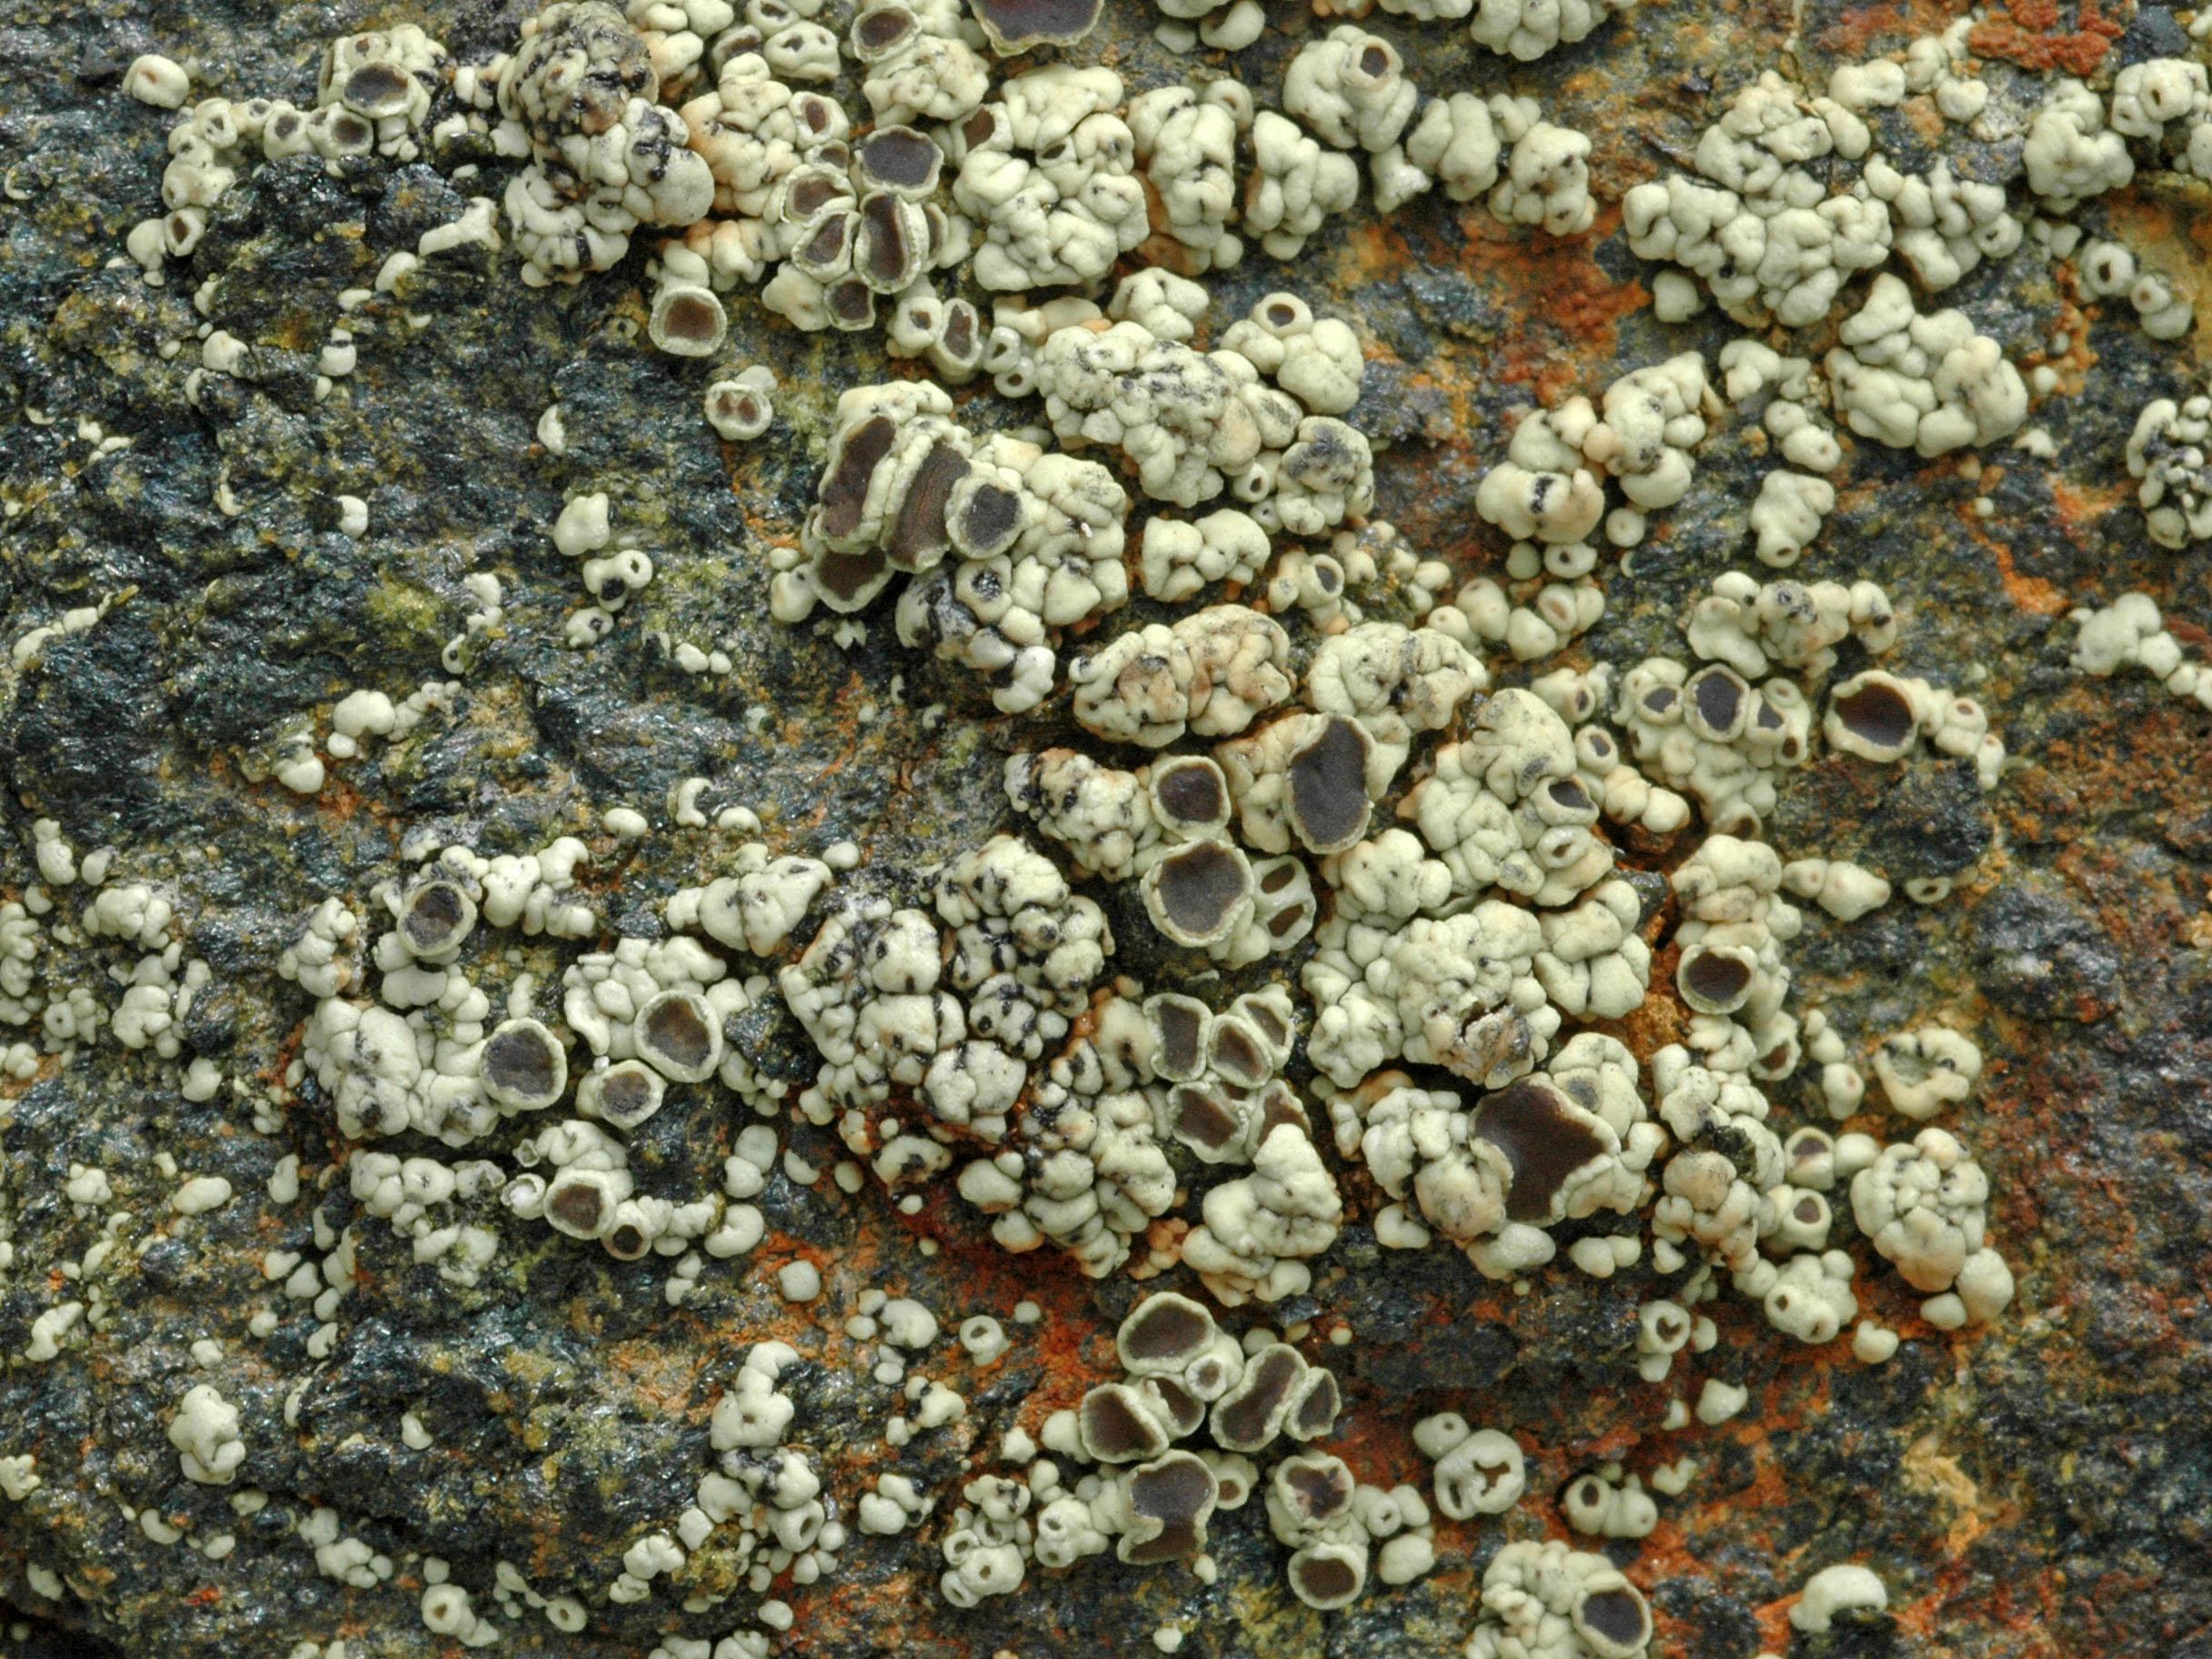 Lecanora frustulosa